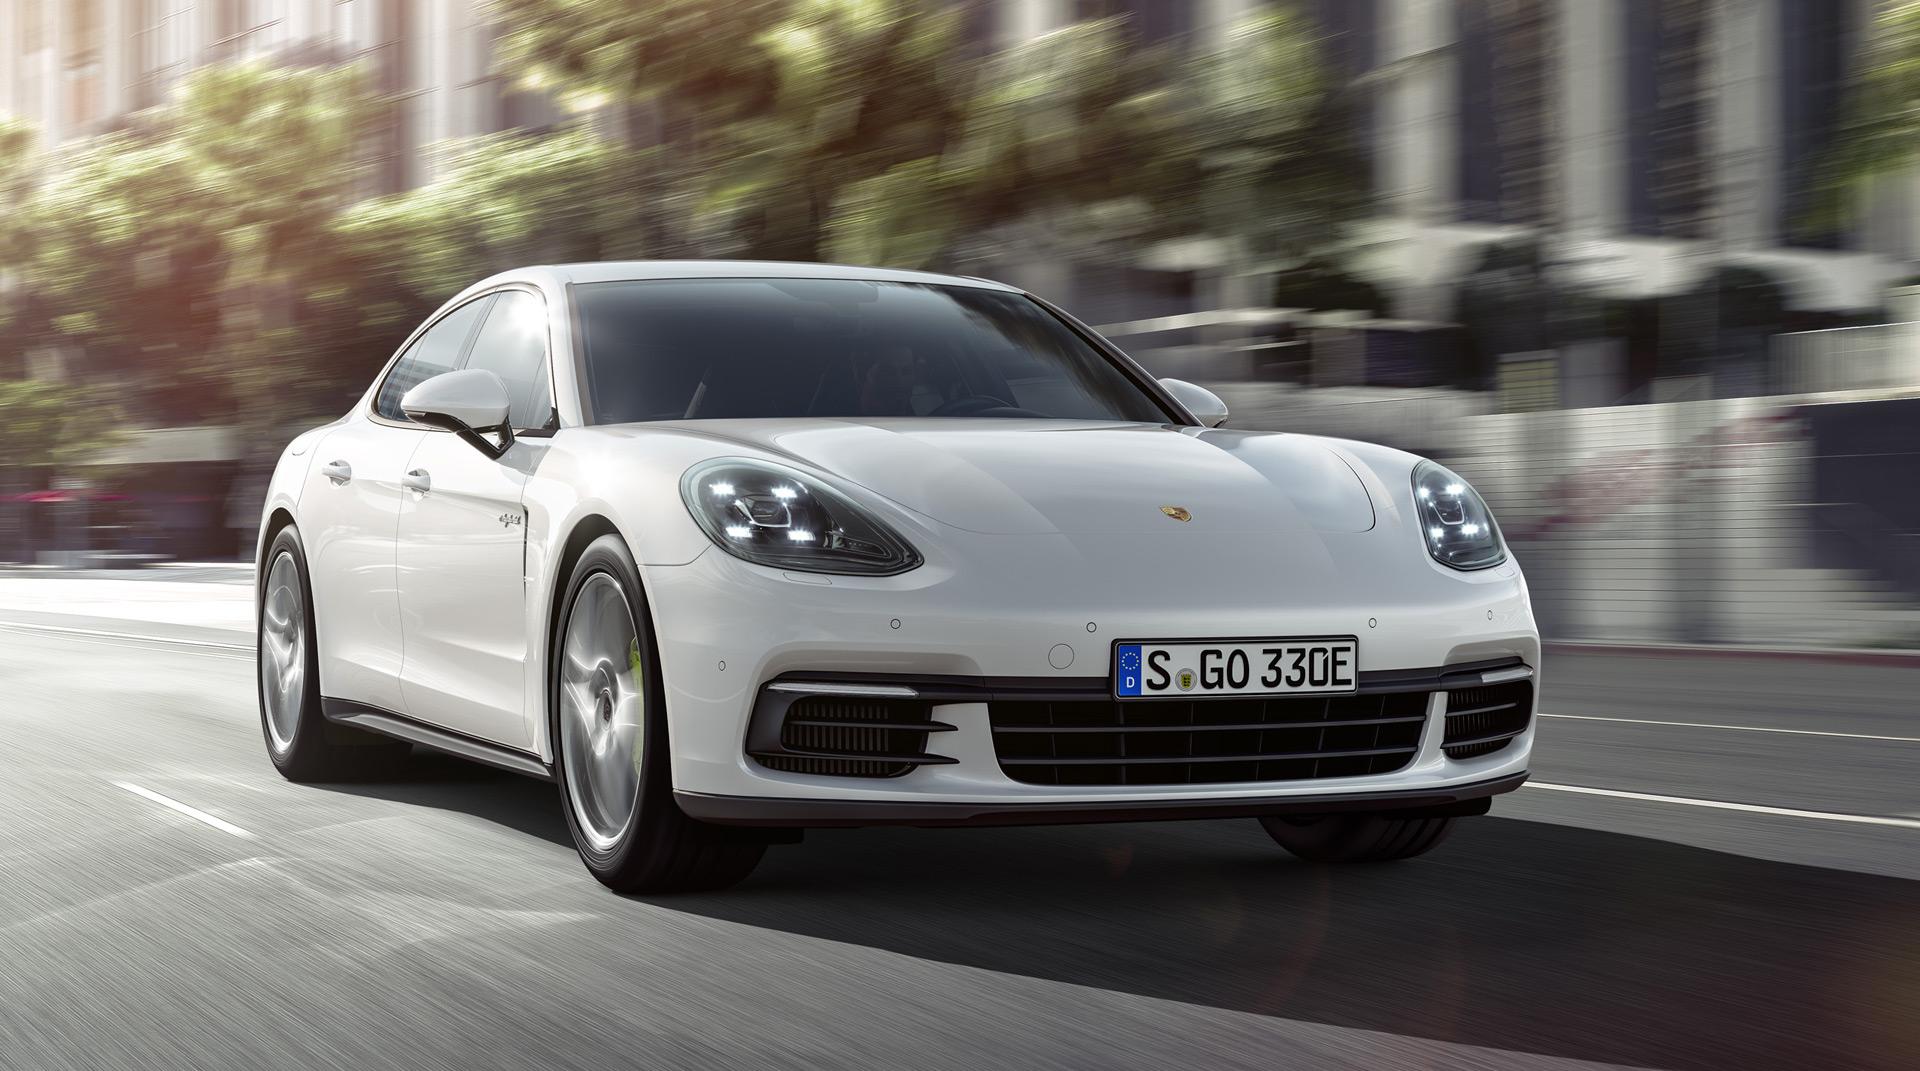 2018 Porsche Panamera 4 E Hybrid 462 Hp 0 60 In S 31 Mi Electric Range